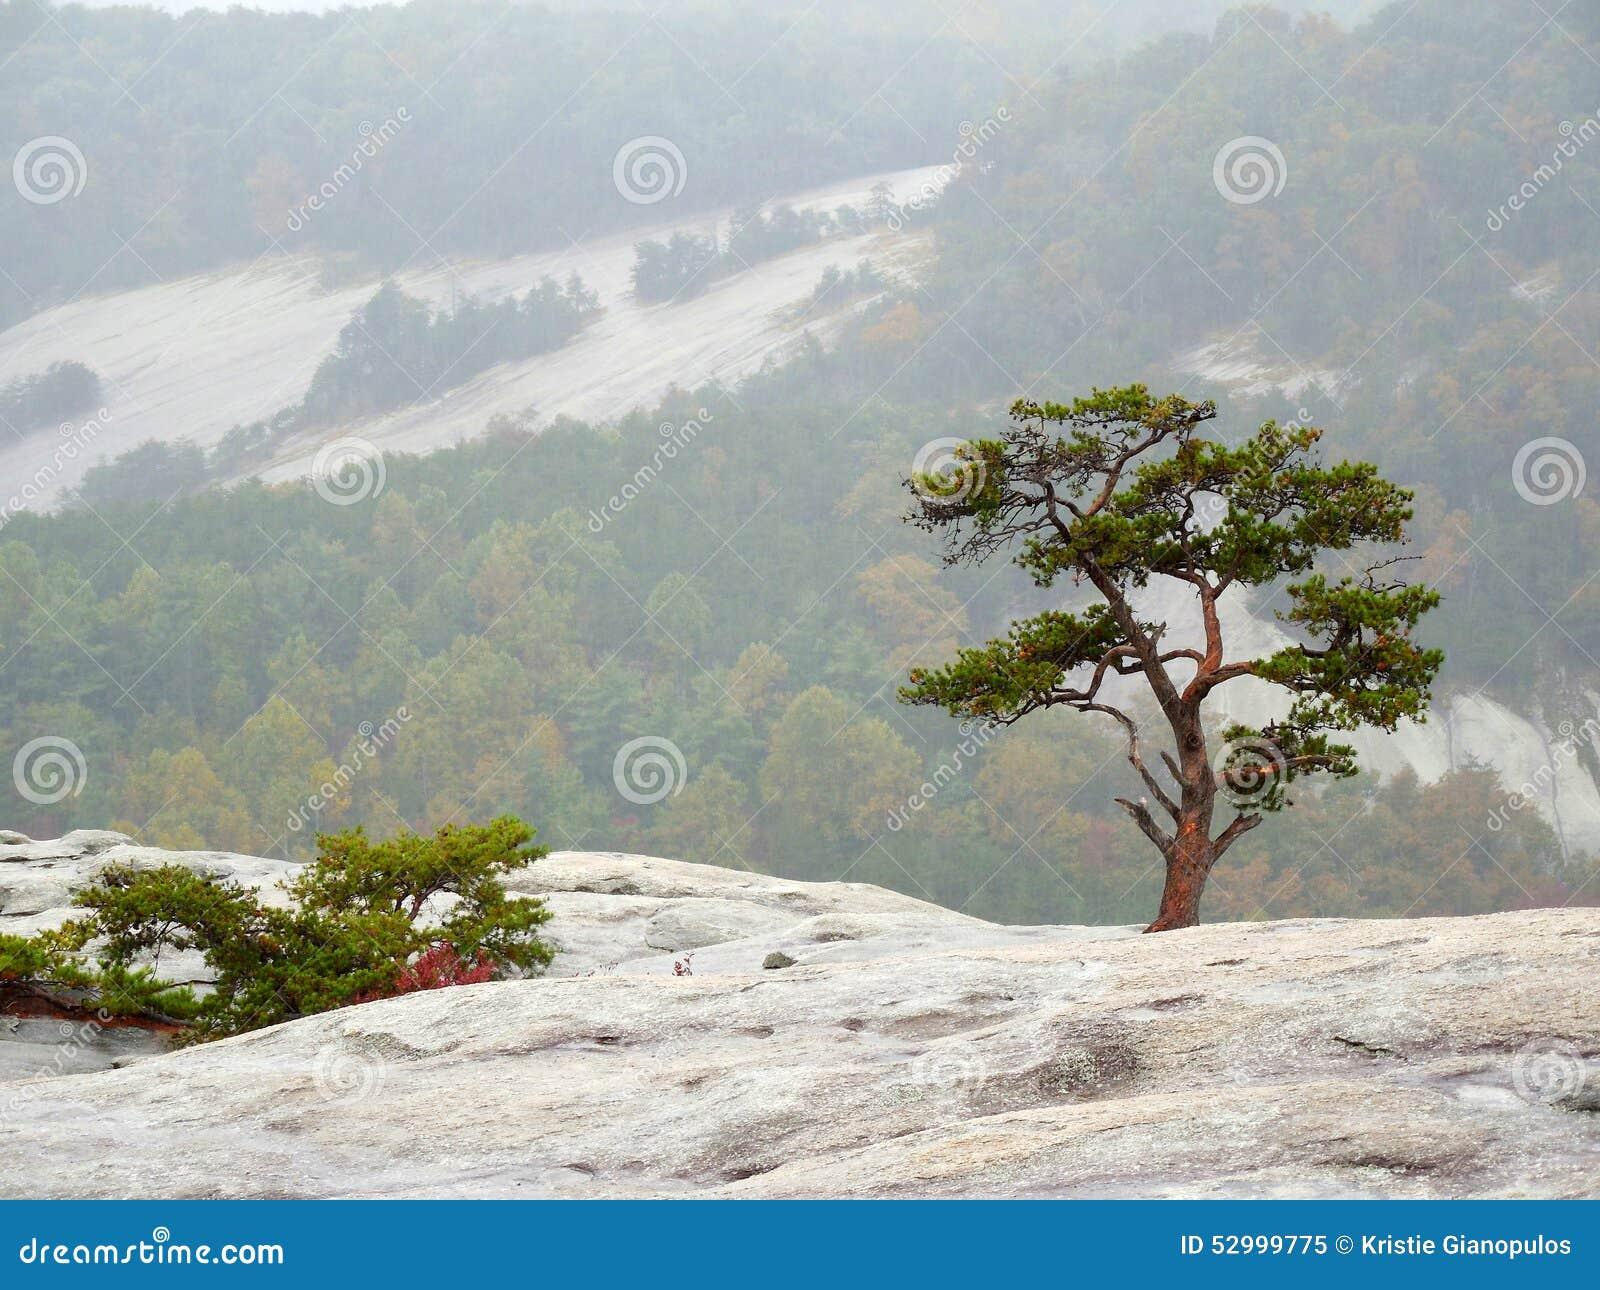 appalachian blue ridge mountains wallpaper - photo #40